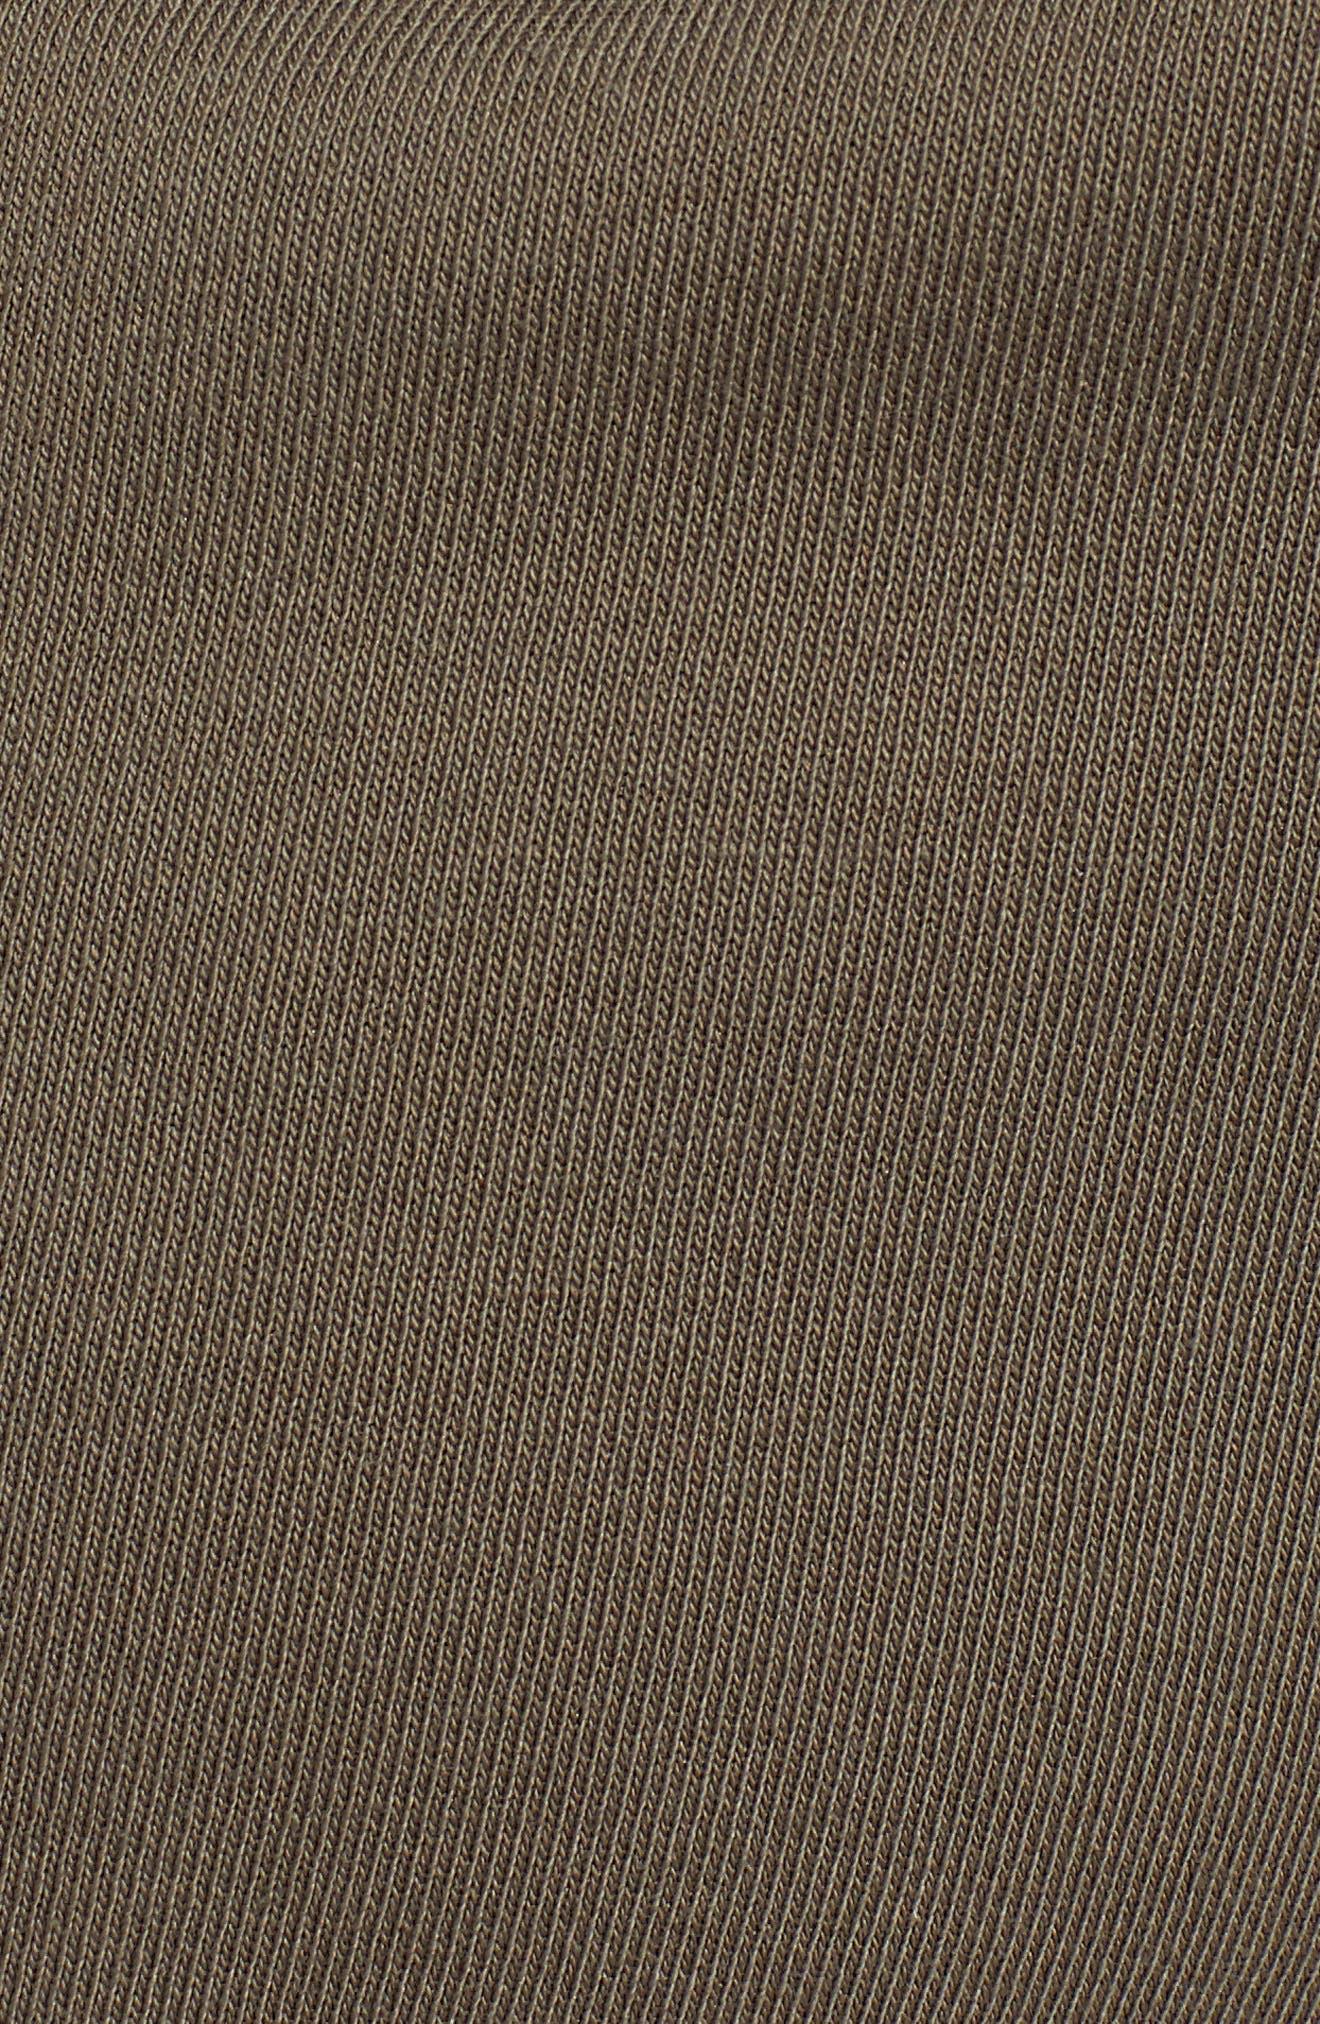 Craft Shorts,                             Alternate thumbnail 6, color,                             CROCODILE